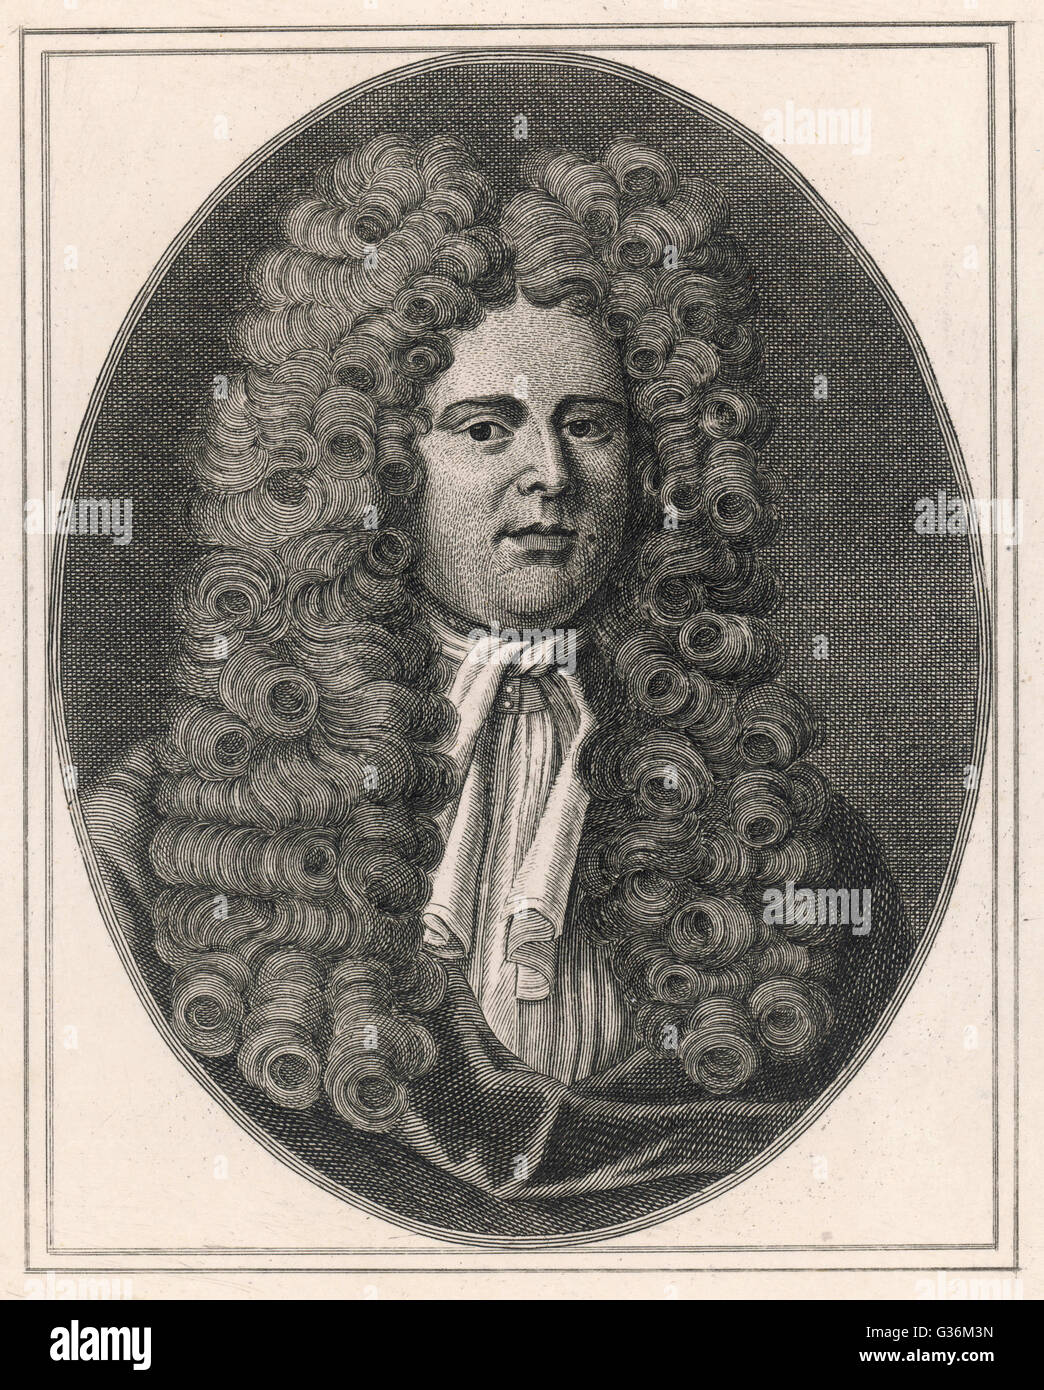 Daniel Defoe (1661-1731) English journalist  and novelist - Stock Image